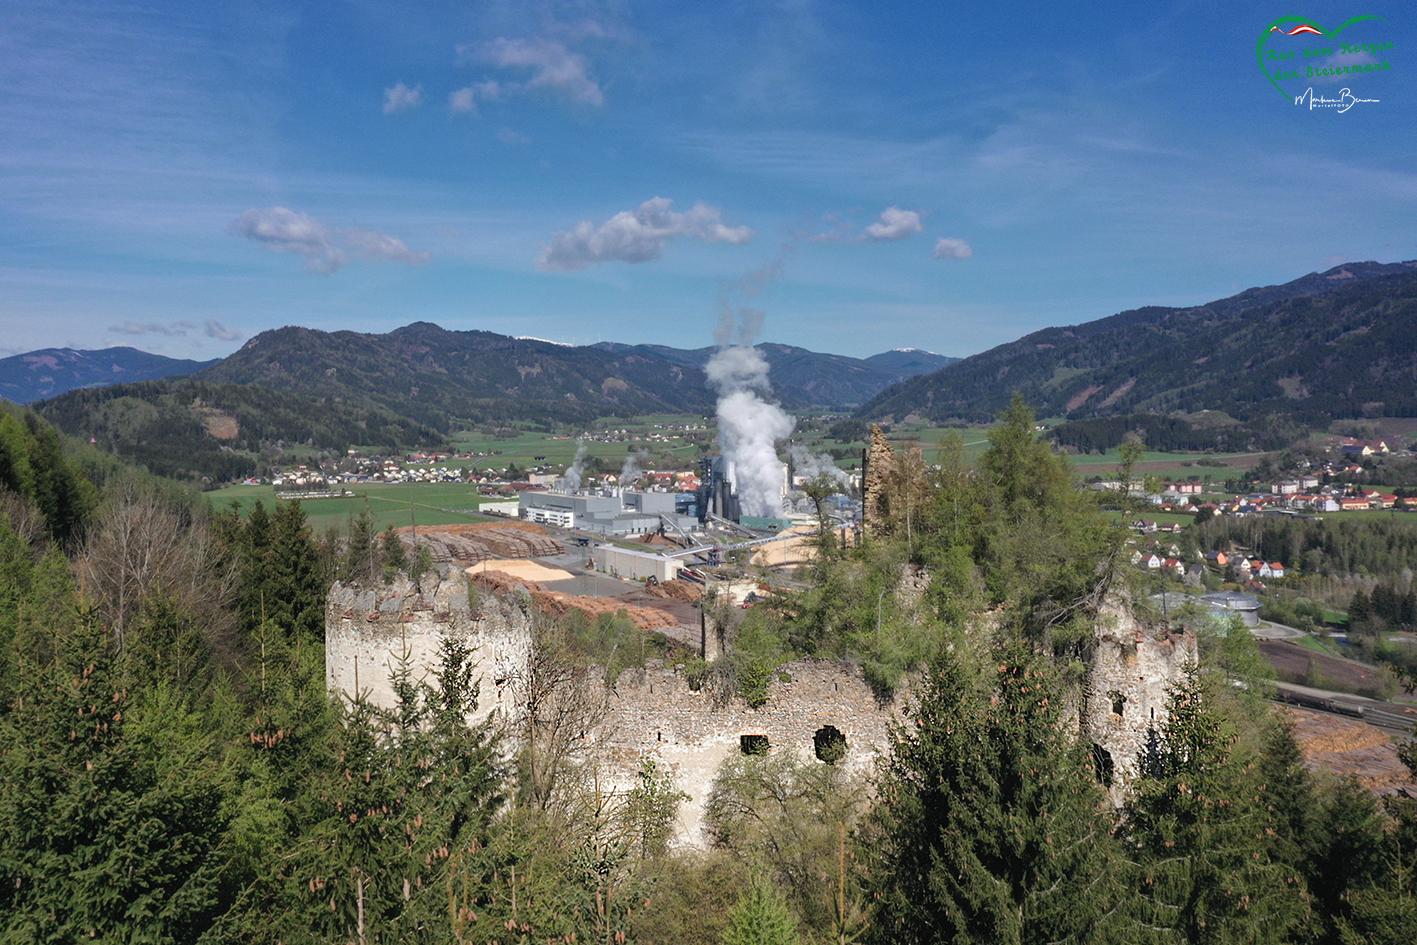 Ruine Reifenstein_DJI_0709